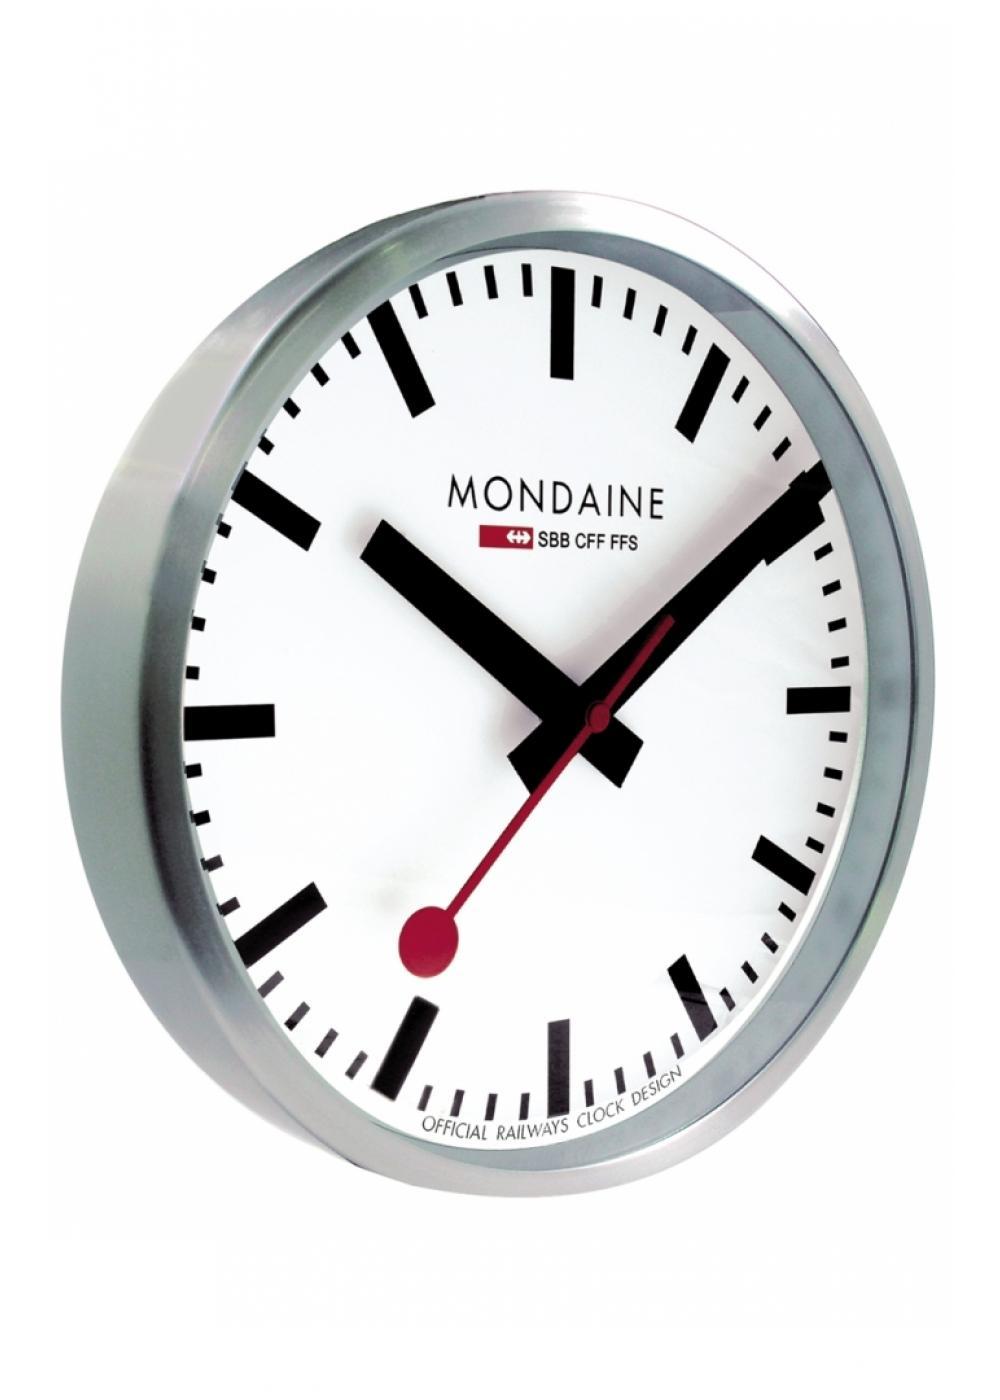 A990 Clock 16sbb Mondaine Wall Clock 250mm Alarm